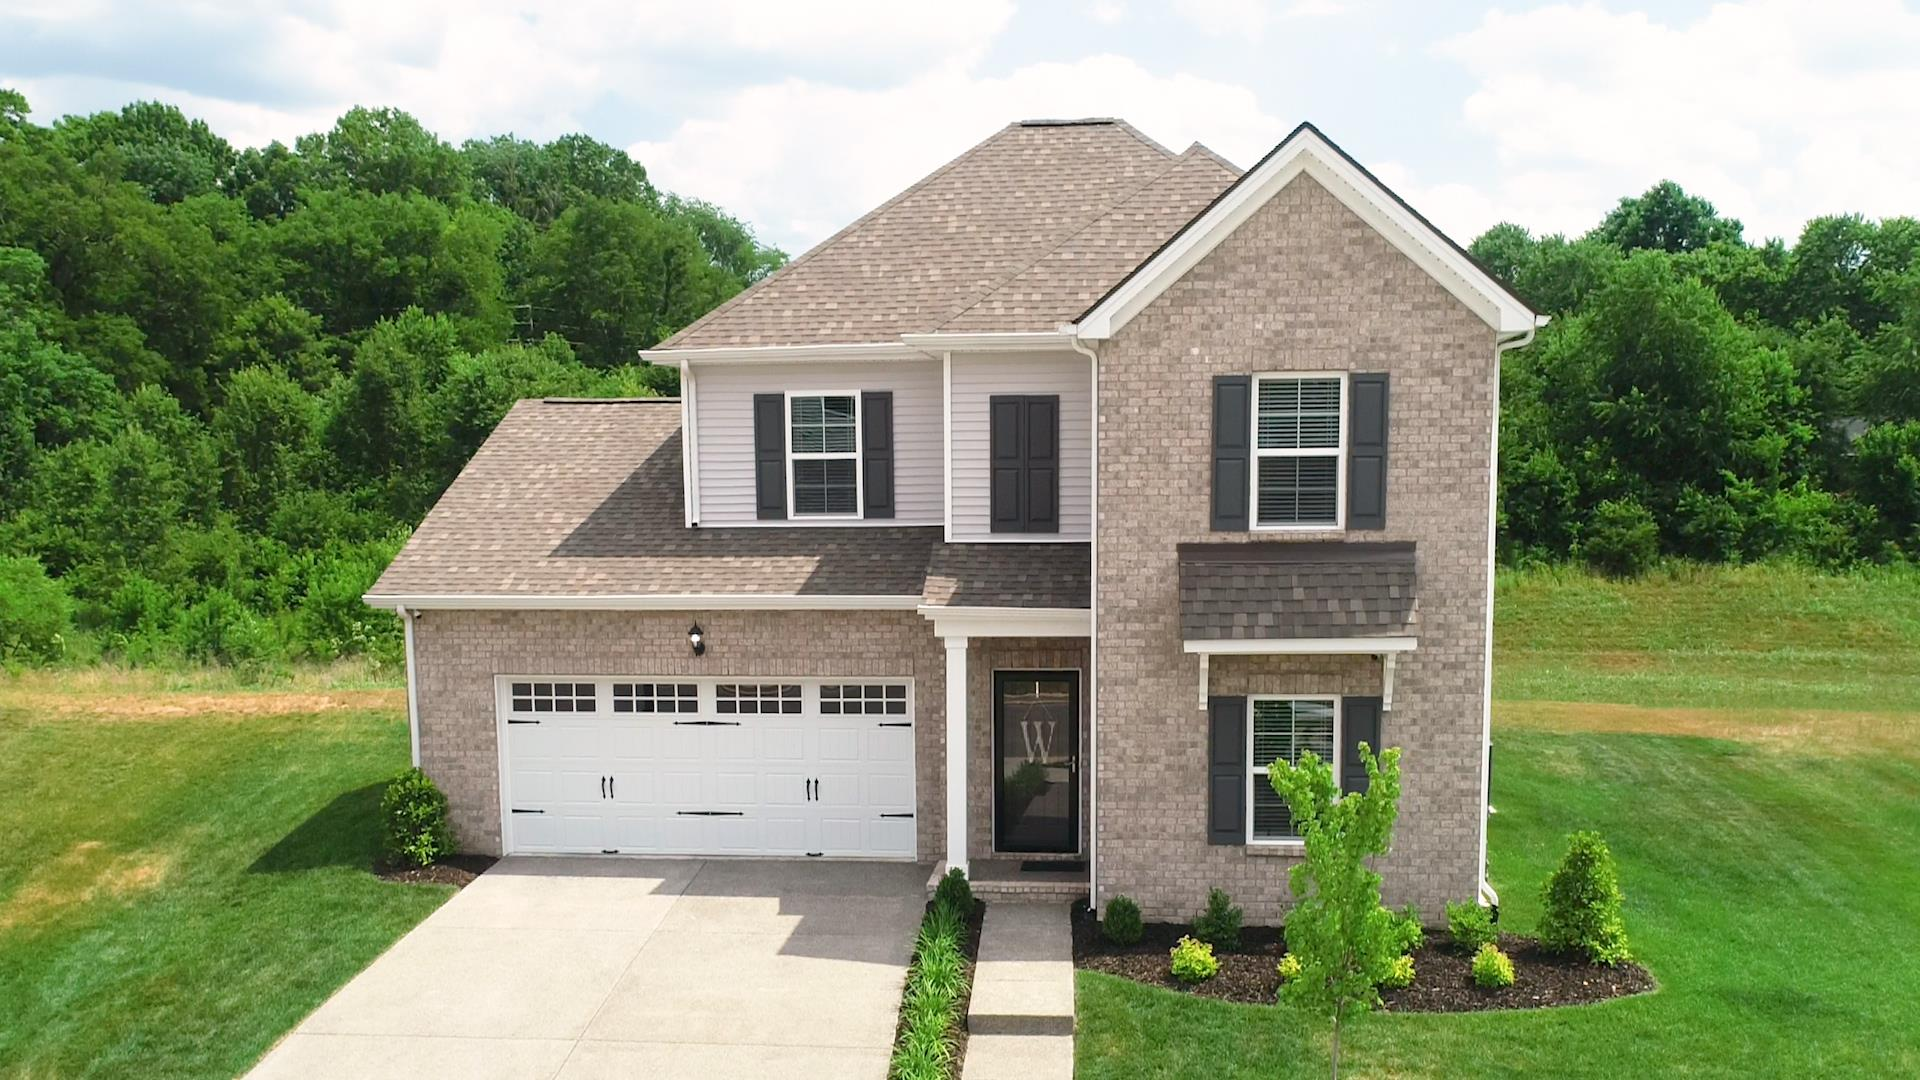 138 Lightwood Dr, Nashville-Antioch, Tennessee